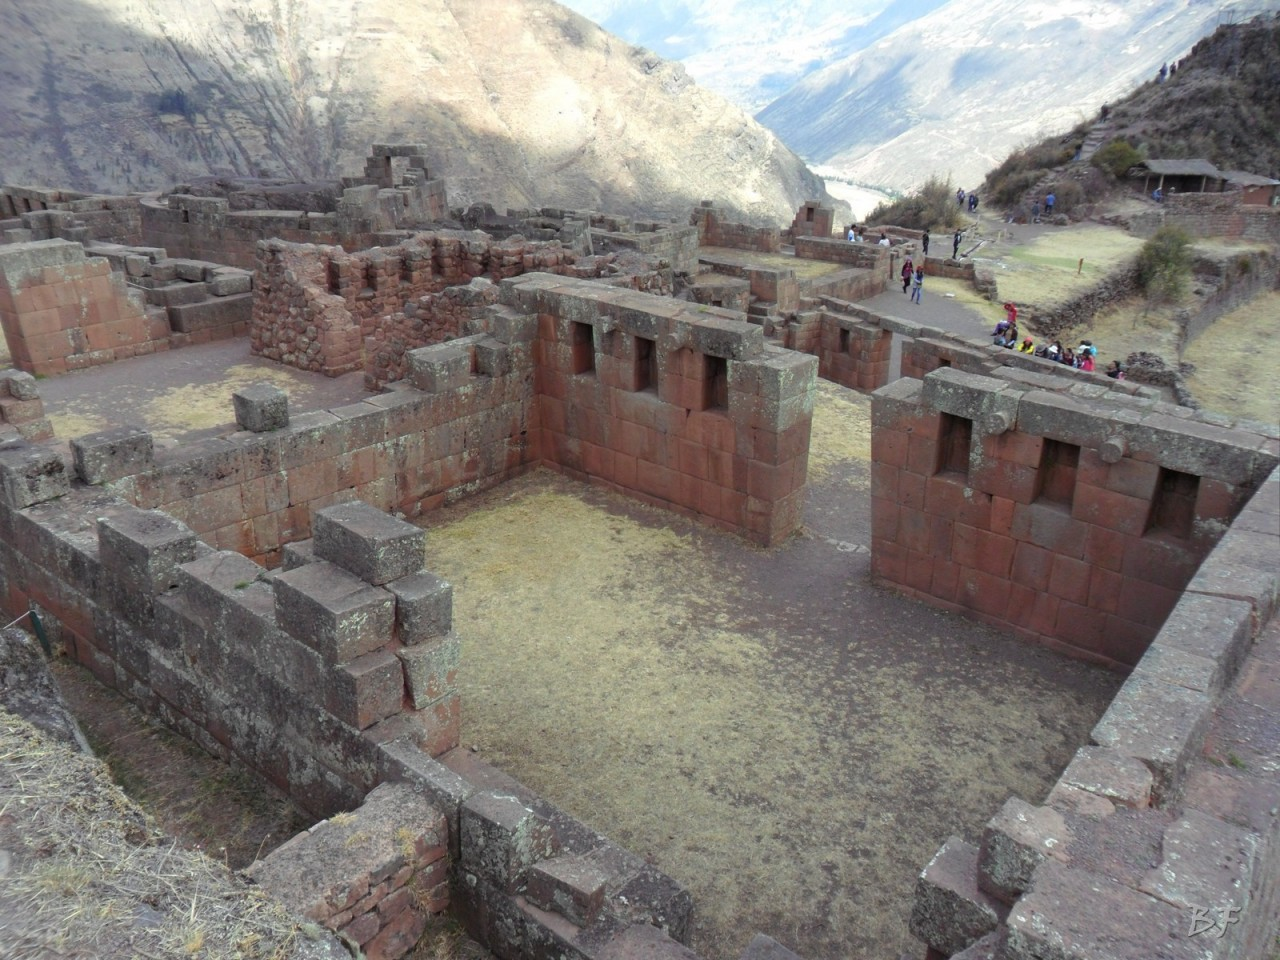 Mura-Poligonali-Megaliti-Altari-Rupestri-Pisac-Cusco-Perù-41